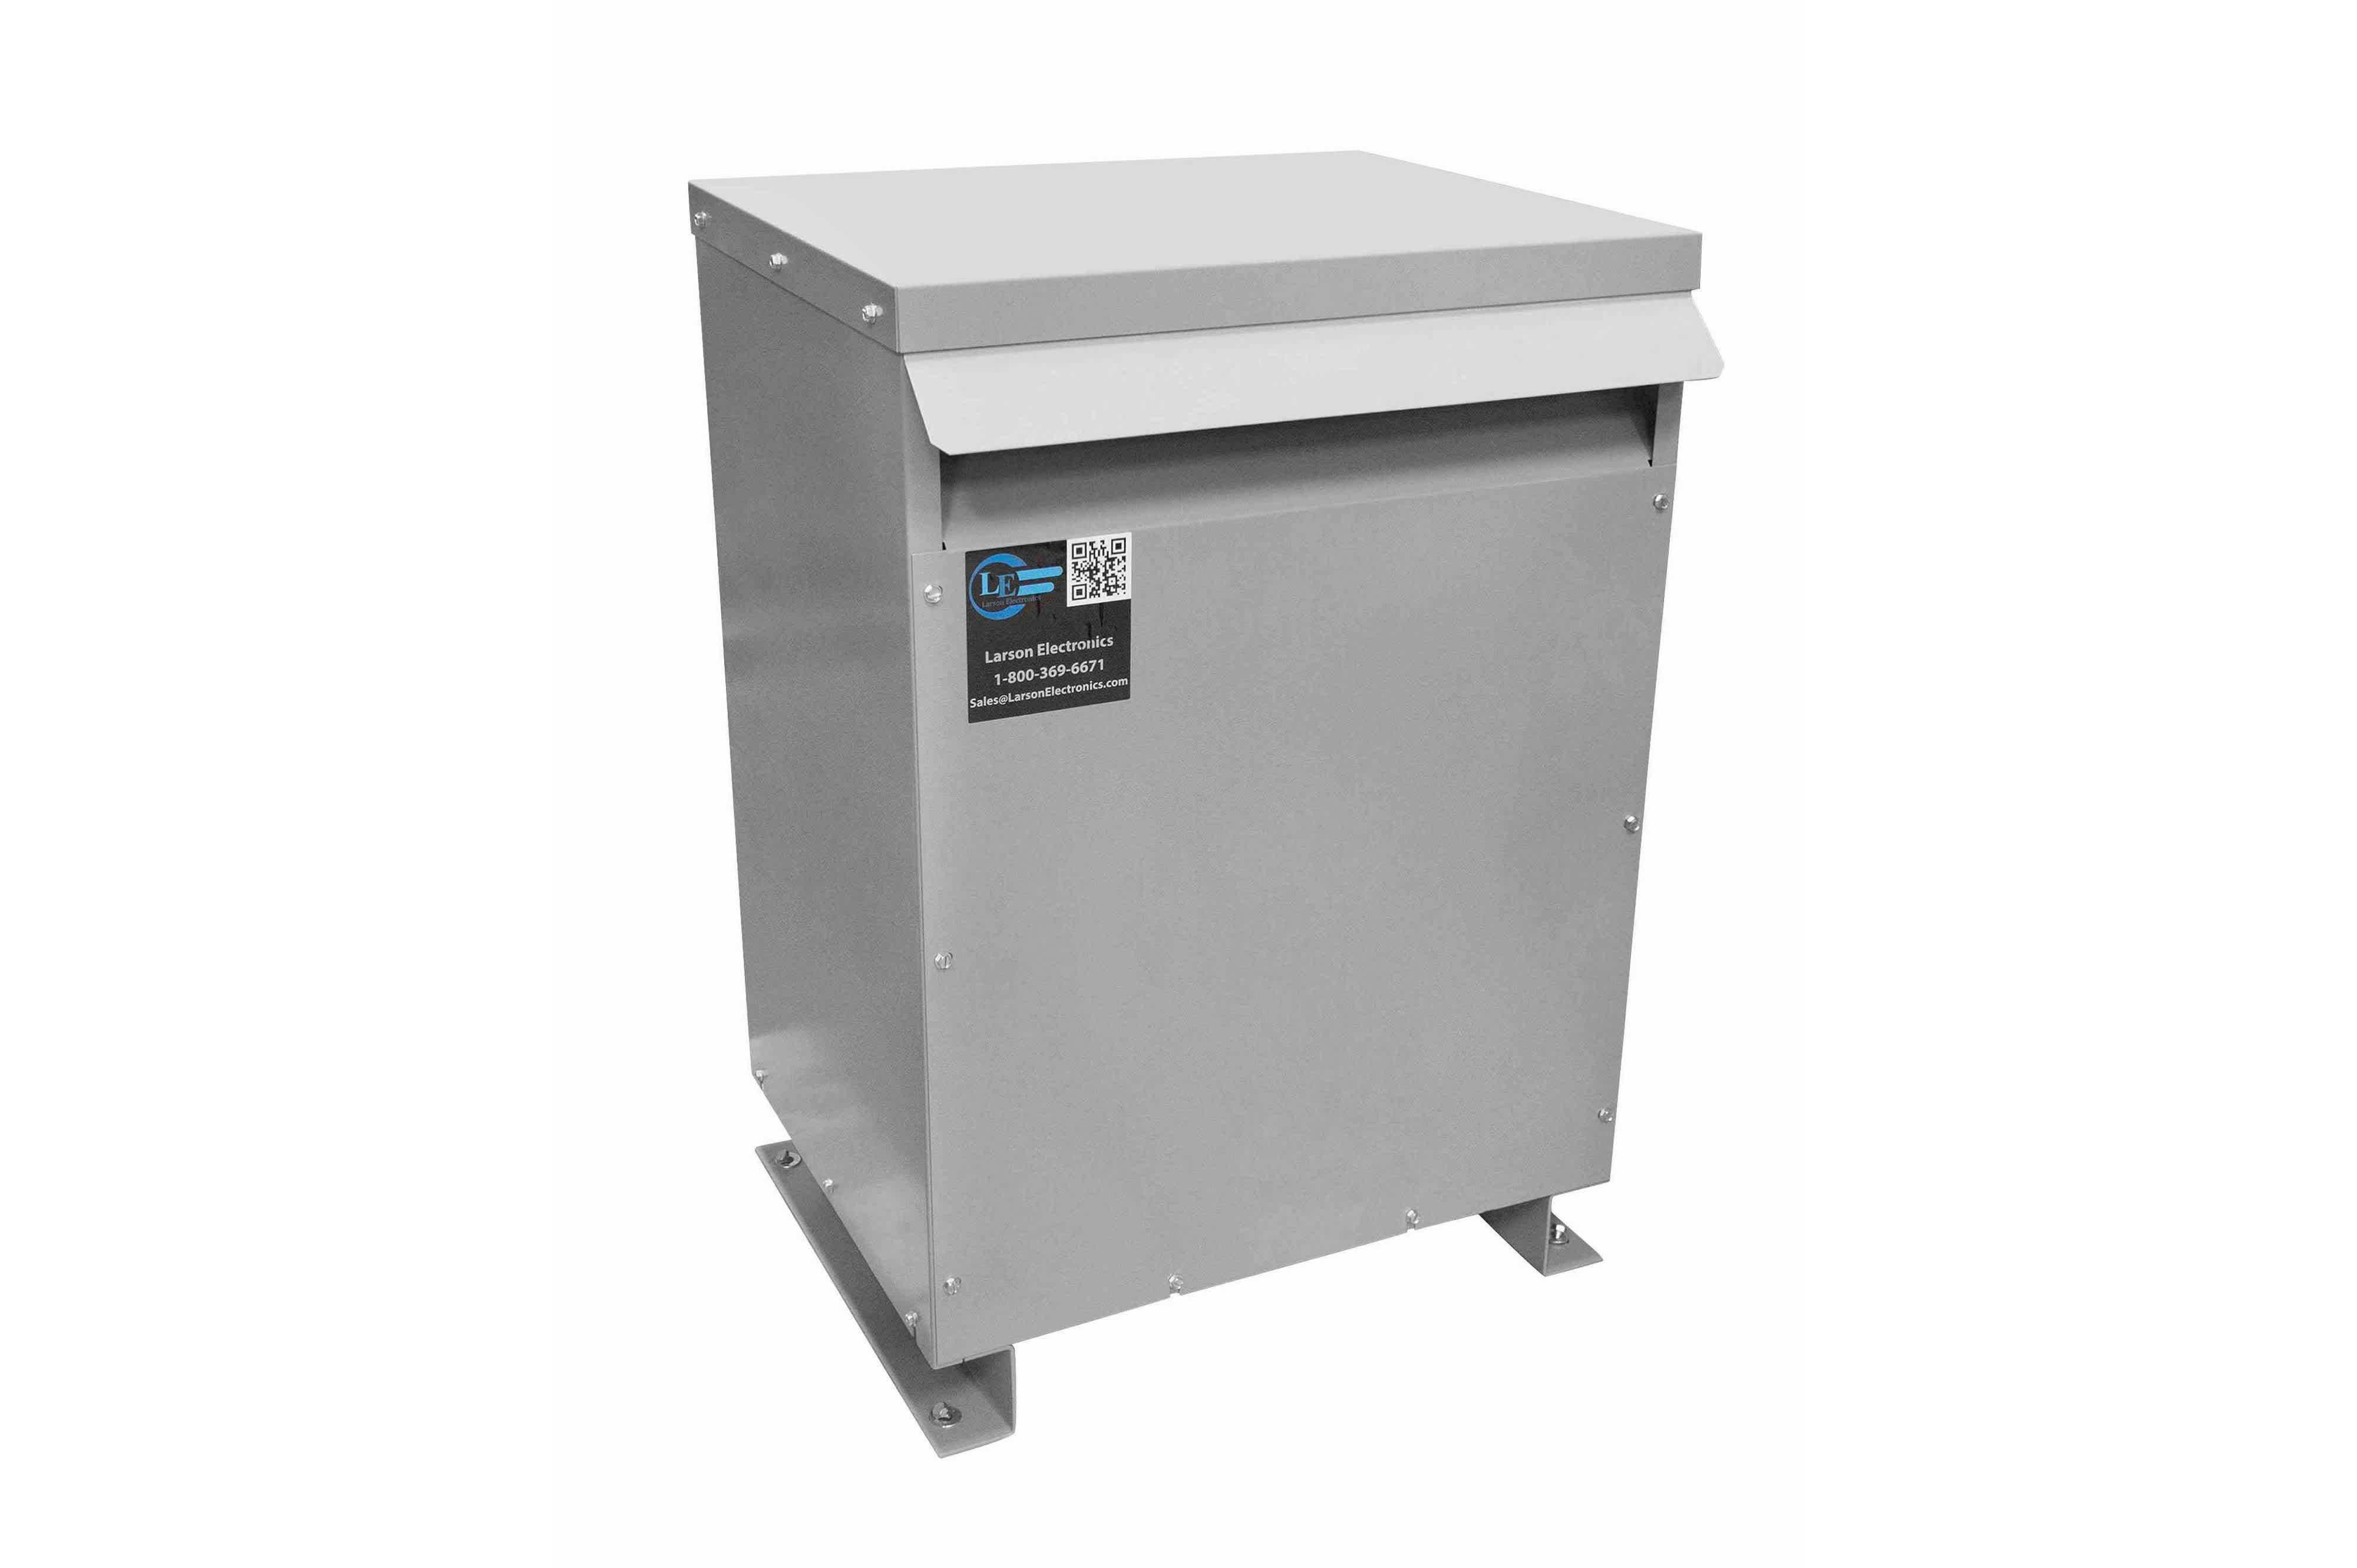 14 kVA 3PH Isolation Transformer, 600V Wye Primary, 480Y/277 Wye-N Secondary, N3R, Ventilated, 60 Hz